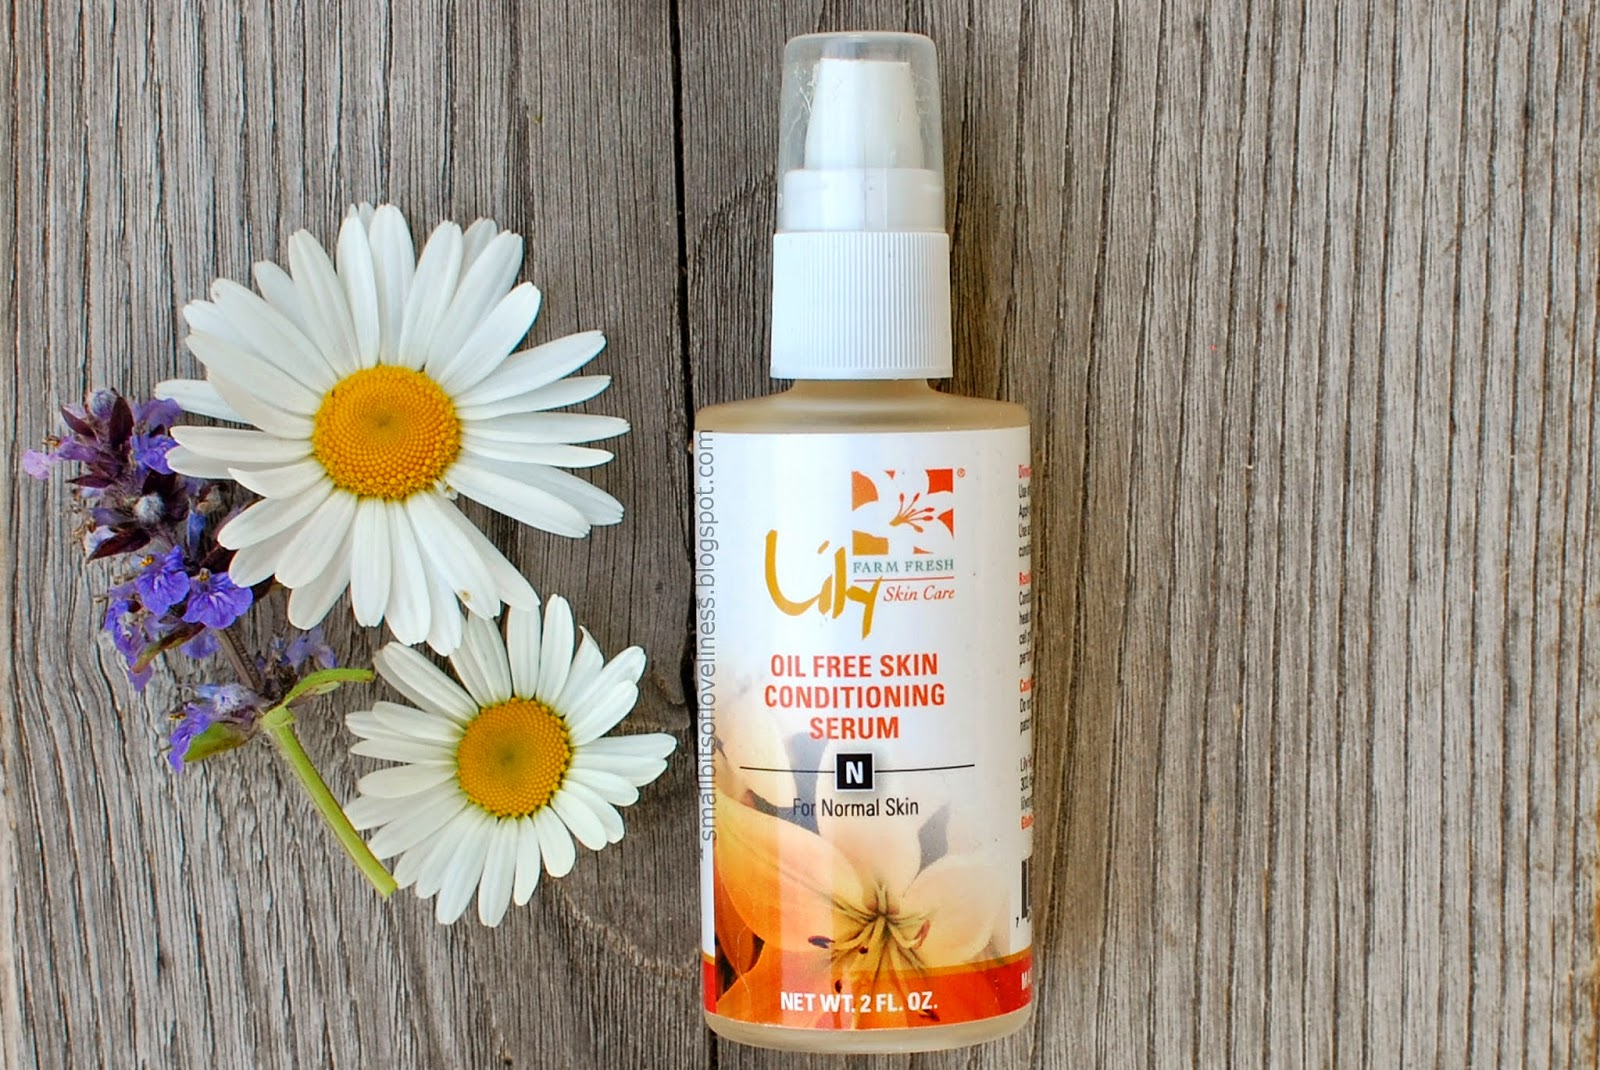 Lily Organics Farm Fresh Oil Free Skin Conditioning Serum for Normal Skin